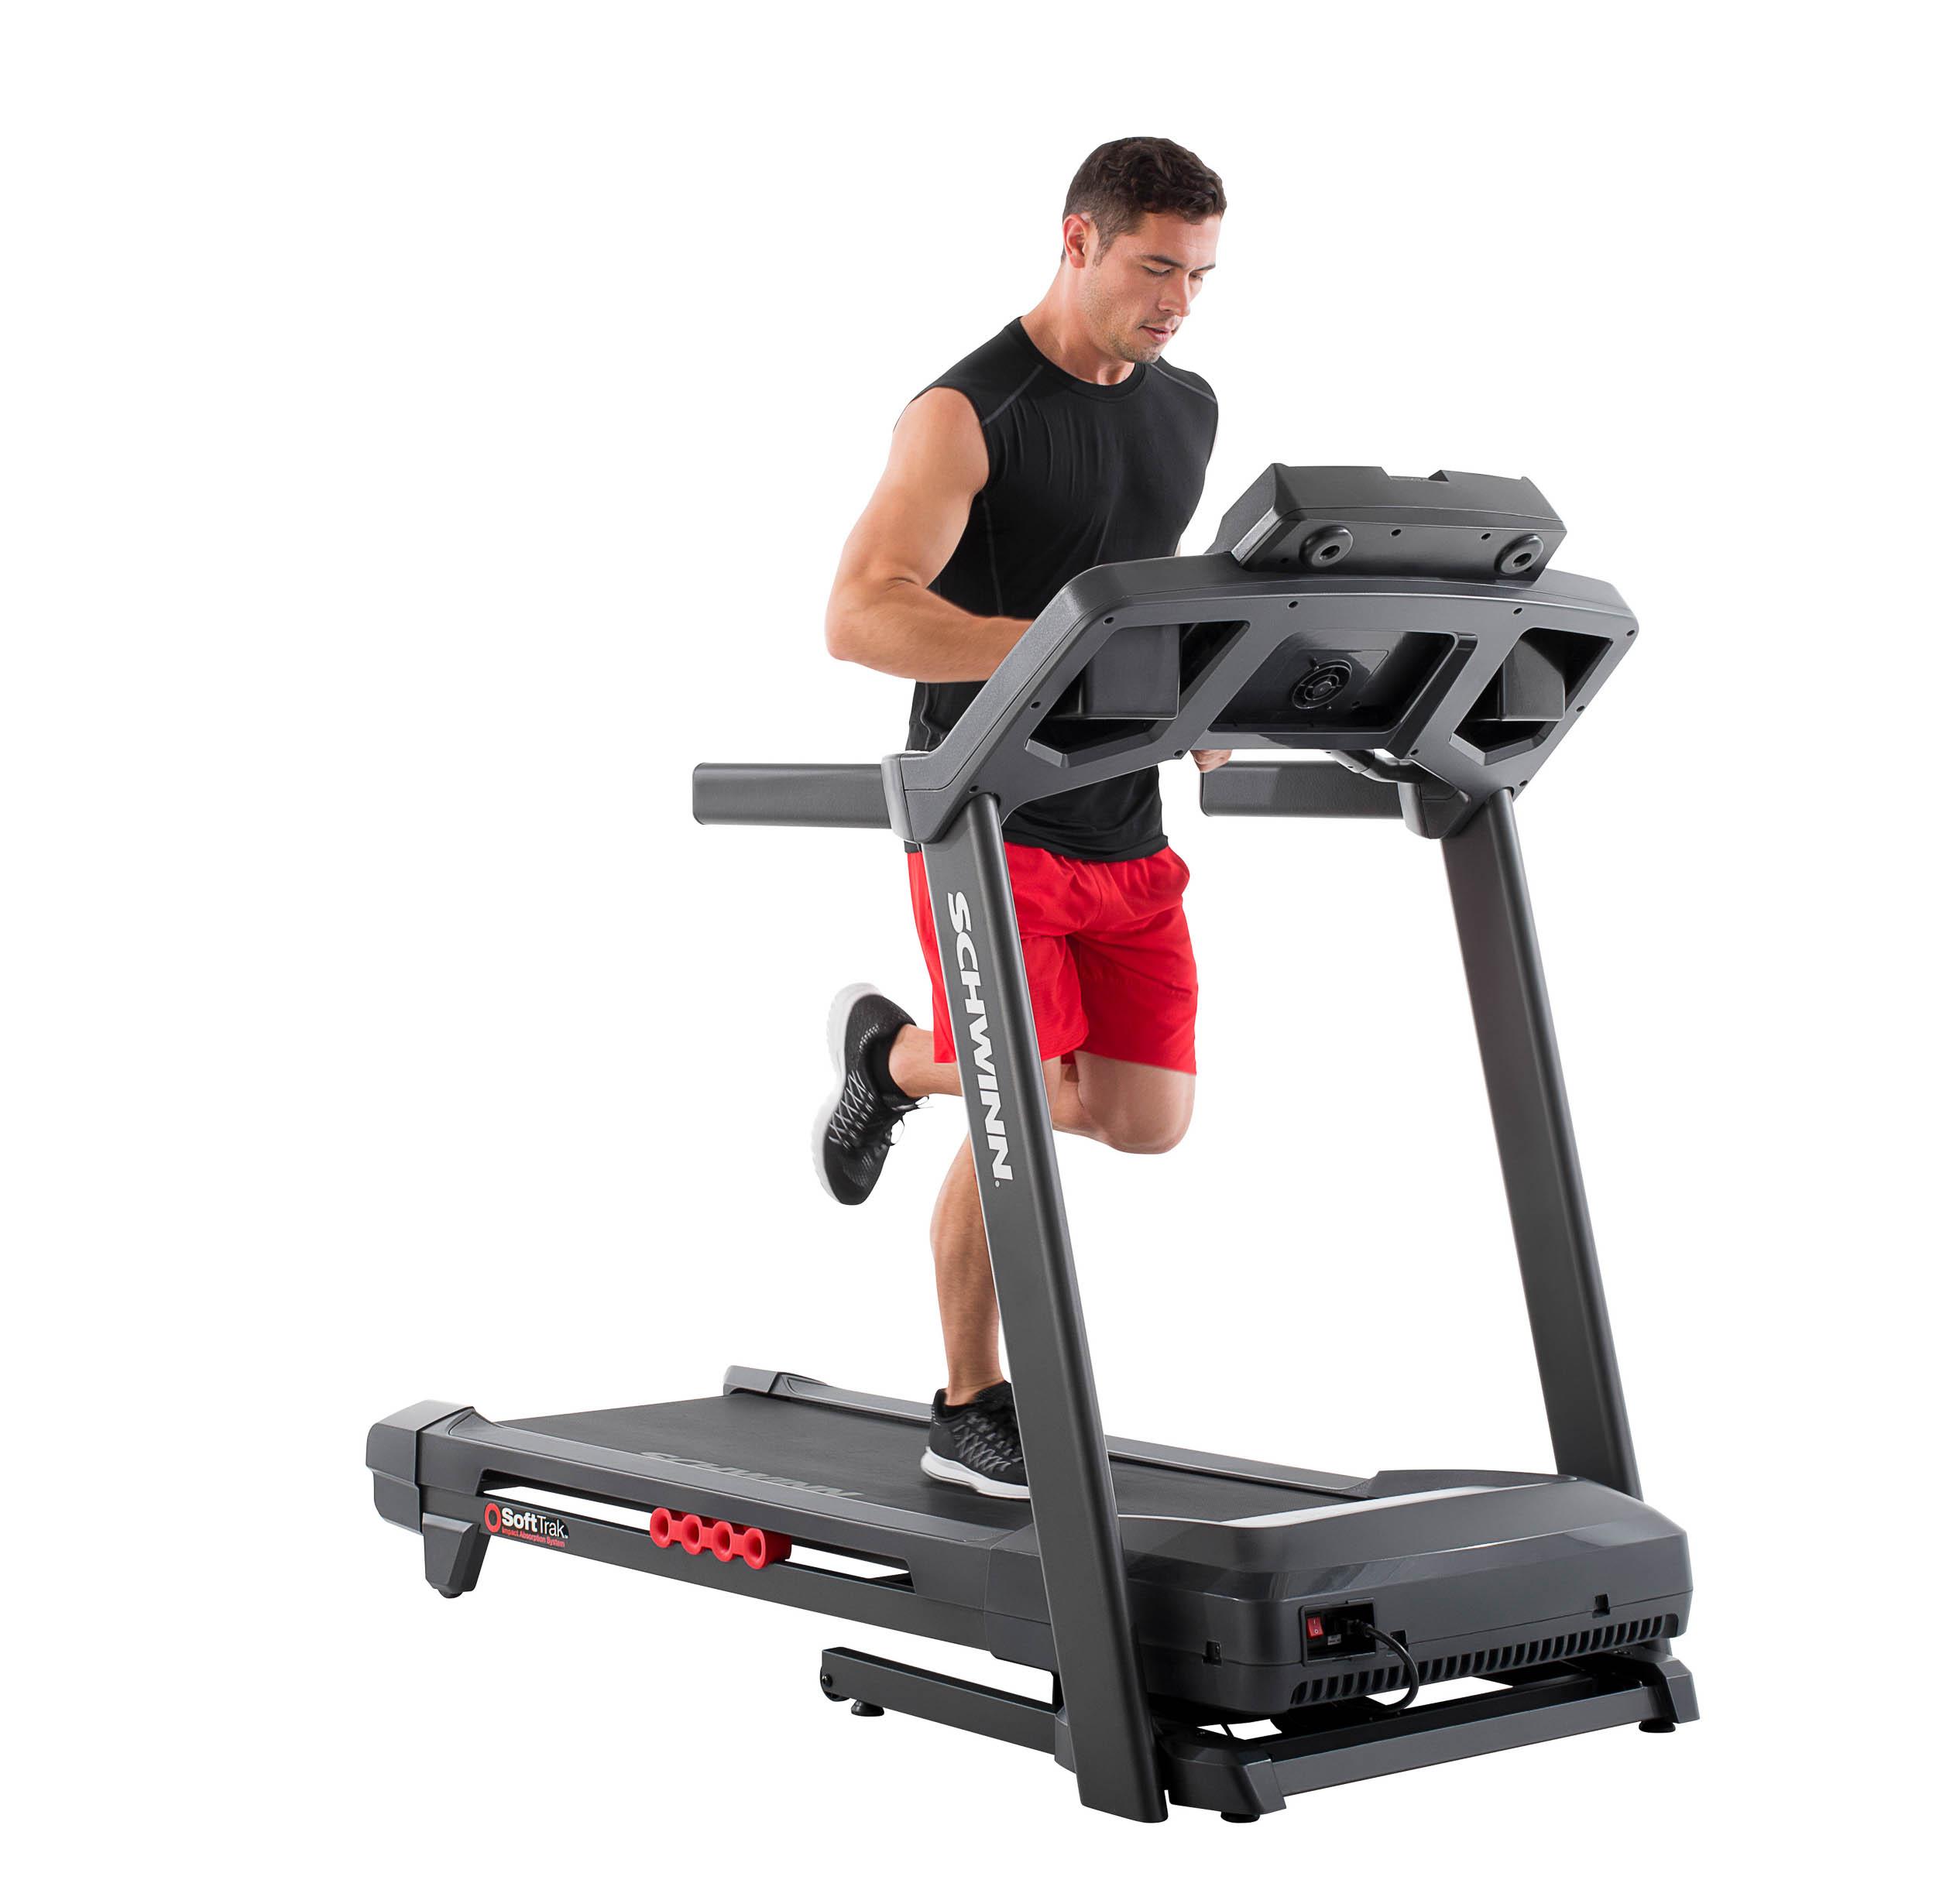 Nautilus_Direct_116099_Schwinn Treadmill 830 Studio Front 3-4 Clay_179 copy.jpg